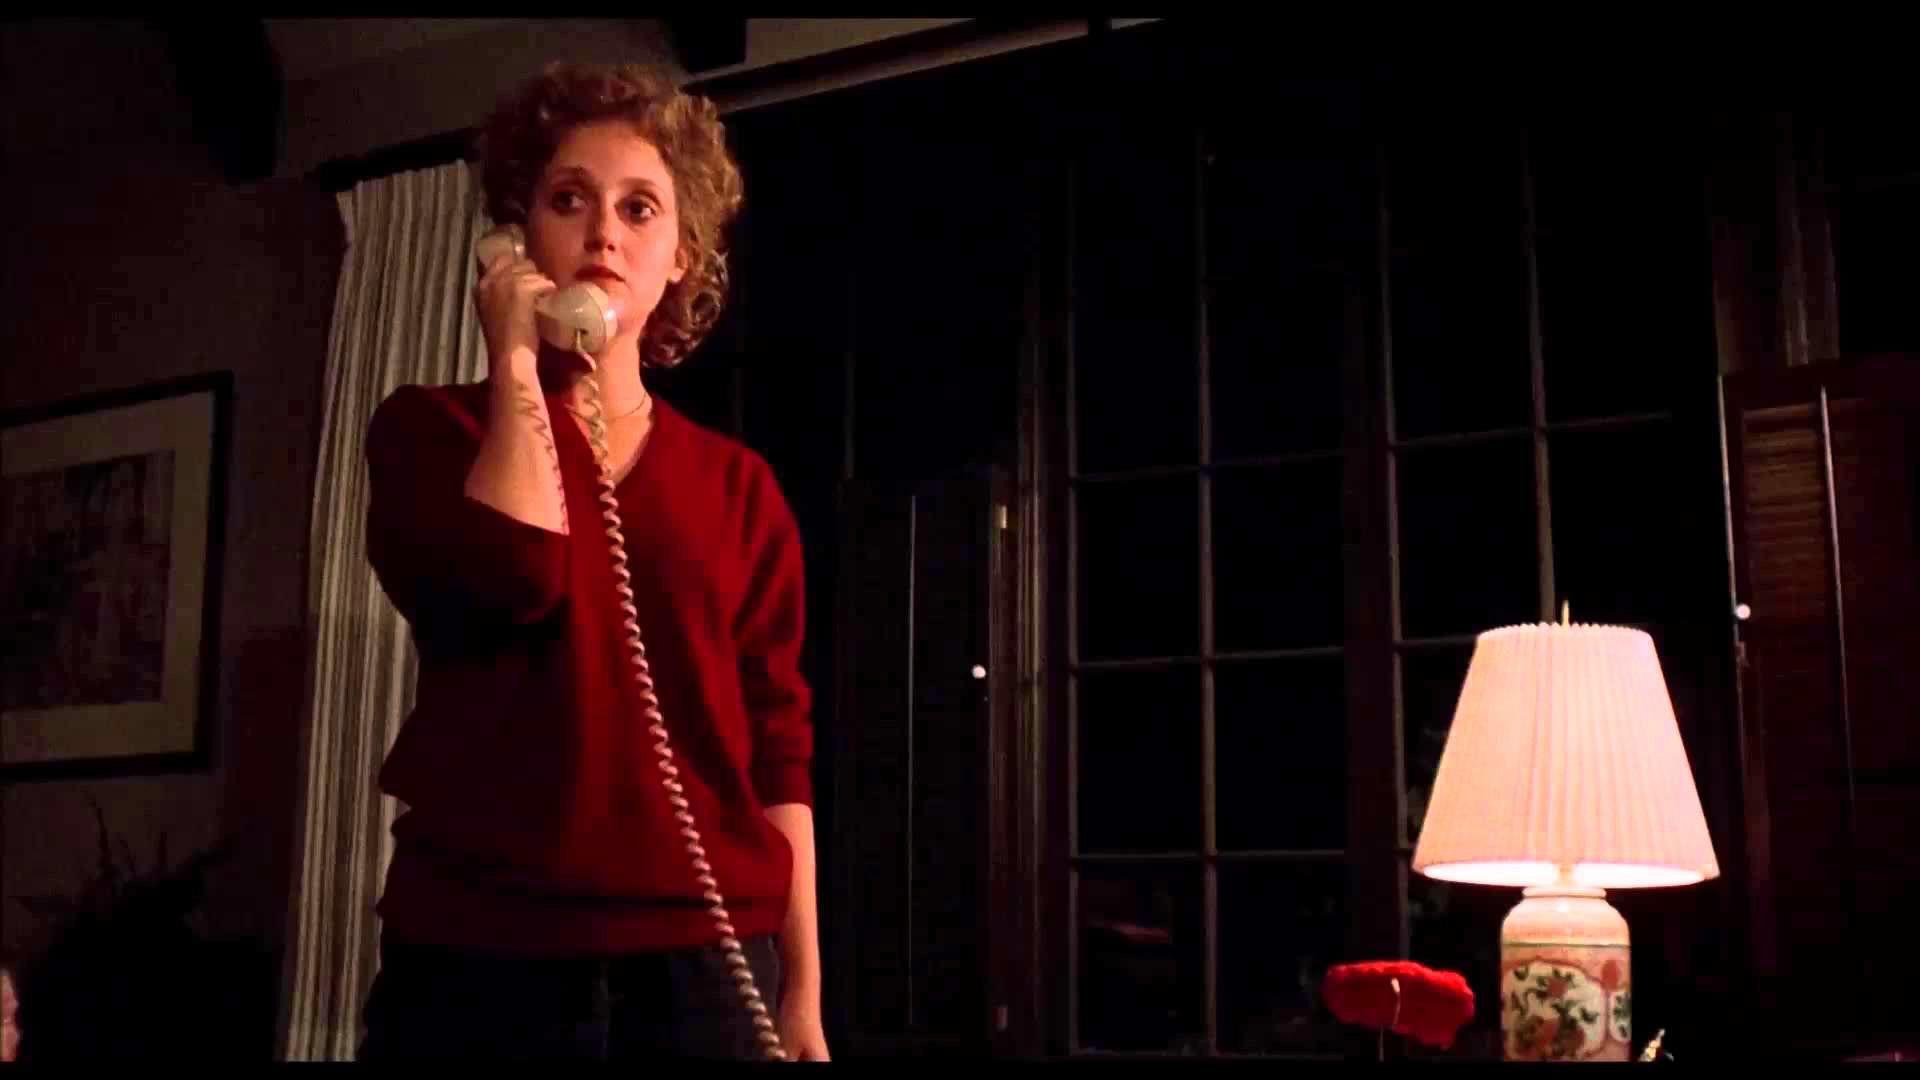 A Stranger Calls When A Stranger Calls En Kurja Polt